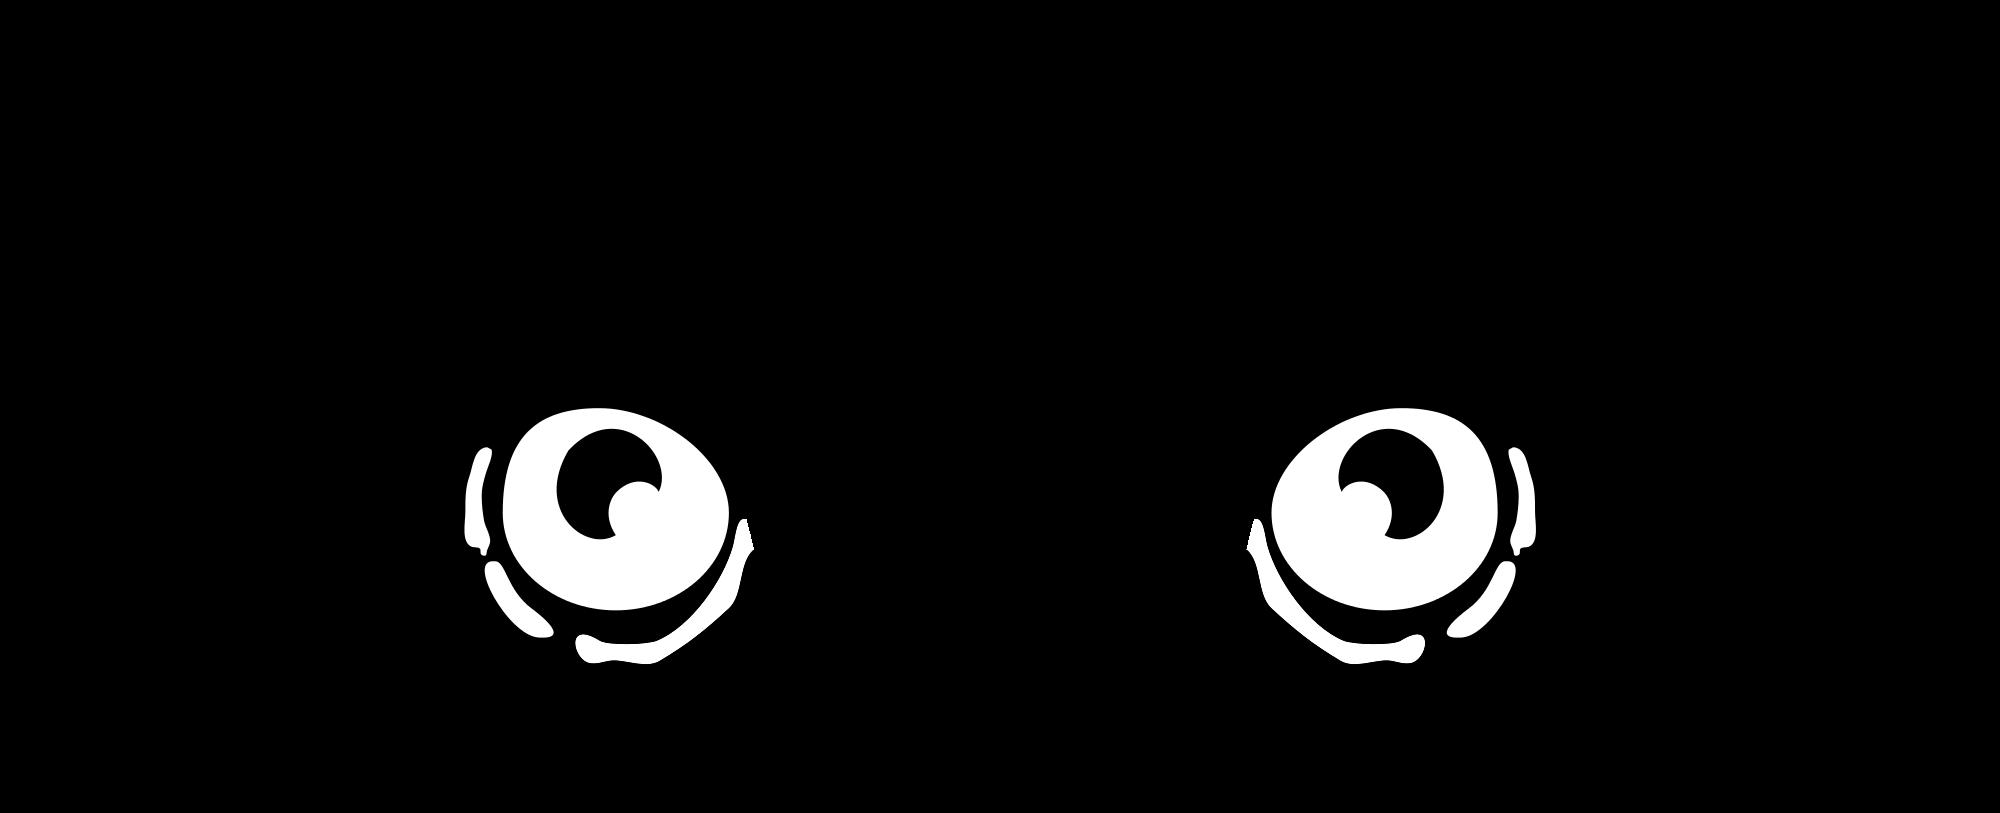 Free Tiger Eye Drawing, Download Free Clip Art, Free Clip.